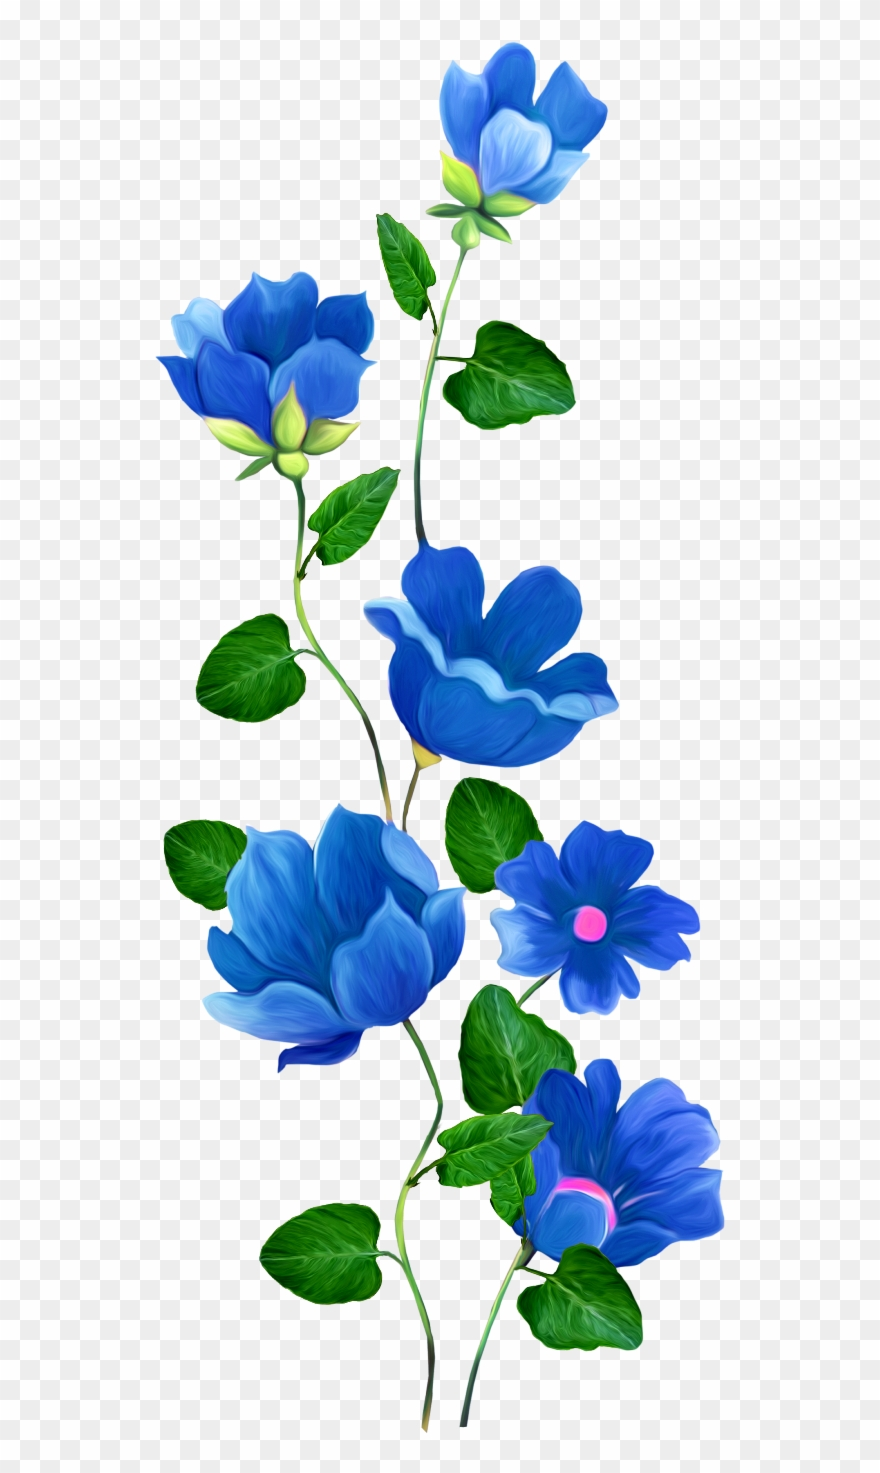 Flower Rose Blue Pin Clip Art - Blue Flower Border Transparent - Png  Download (#4053250) - PinClipart